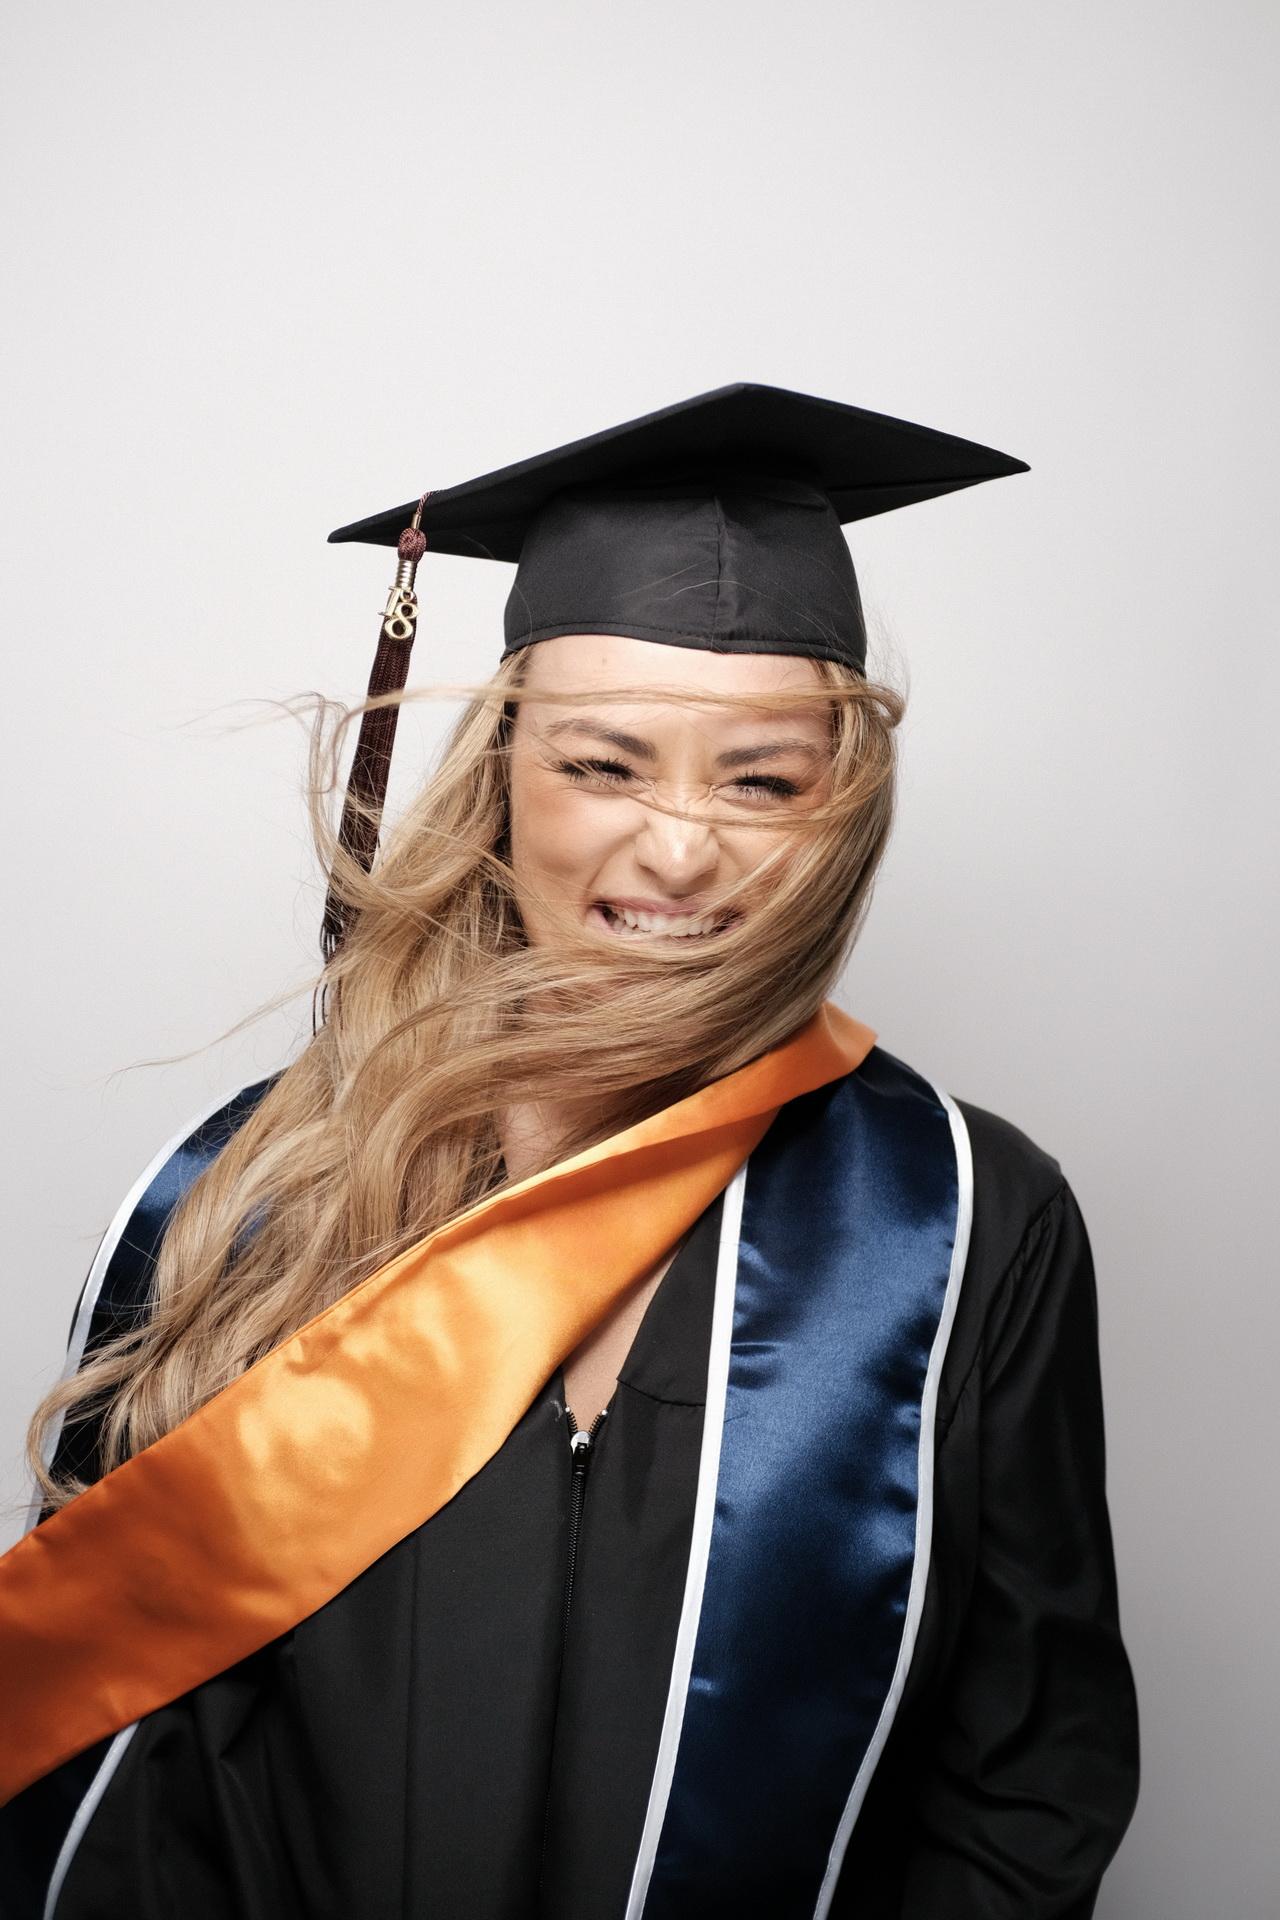 graduation photos orange county by nicole caldwell studio 10